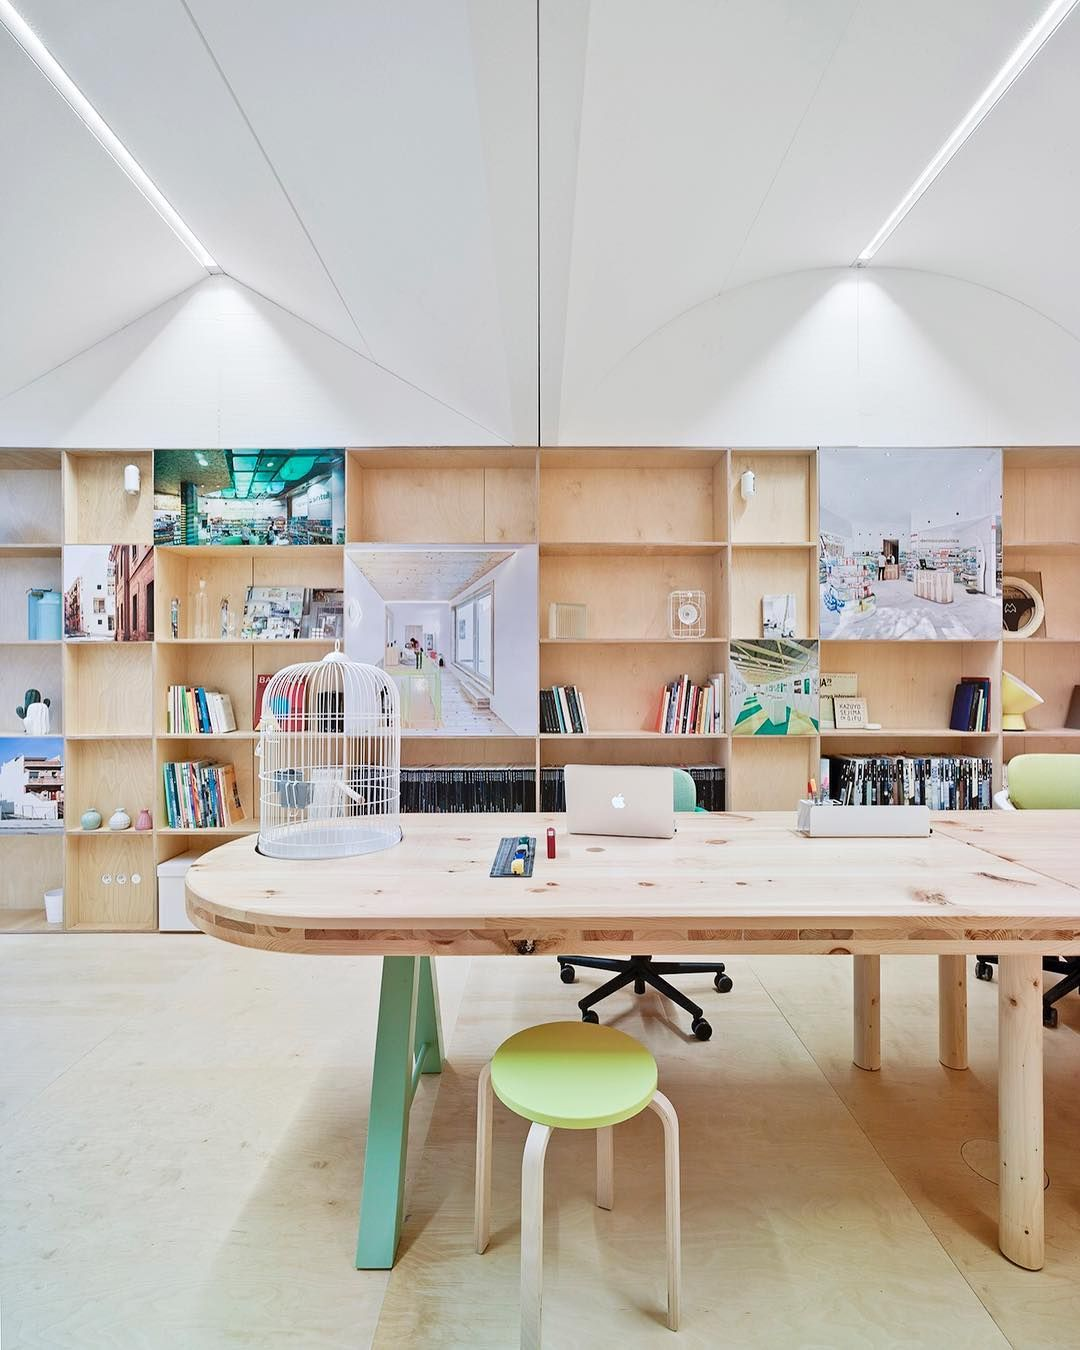 Pin de koulitsa en furniture _ table | Pinterest